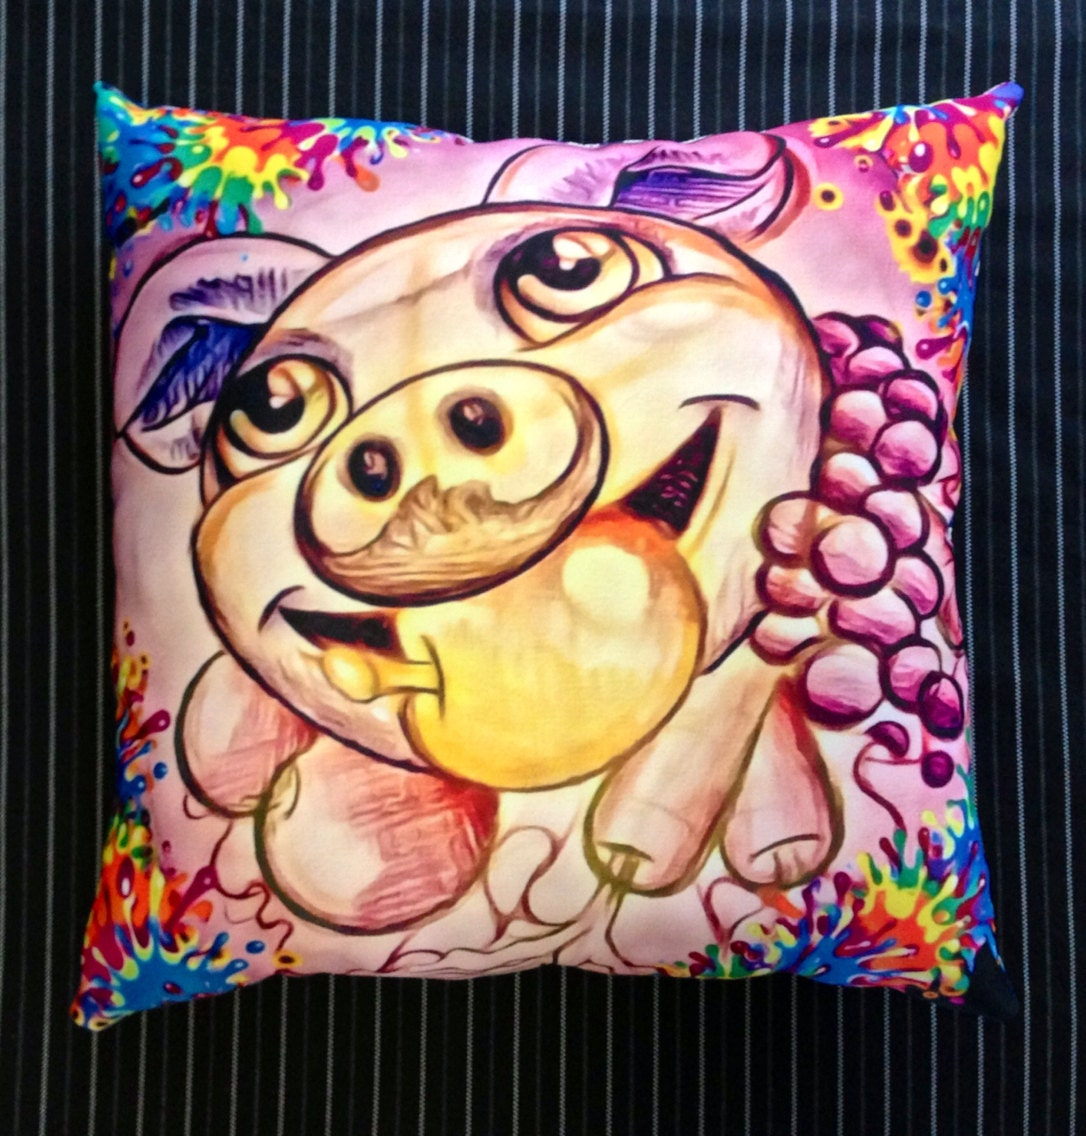 Little Piggy Cushion - RockabillyDawgz